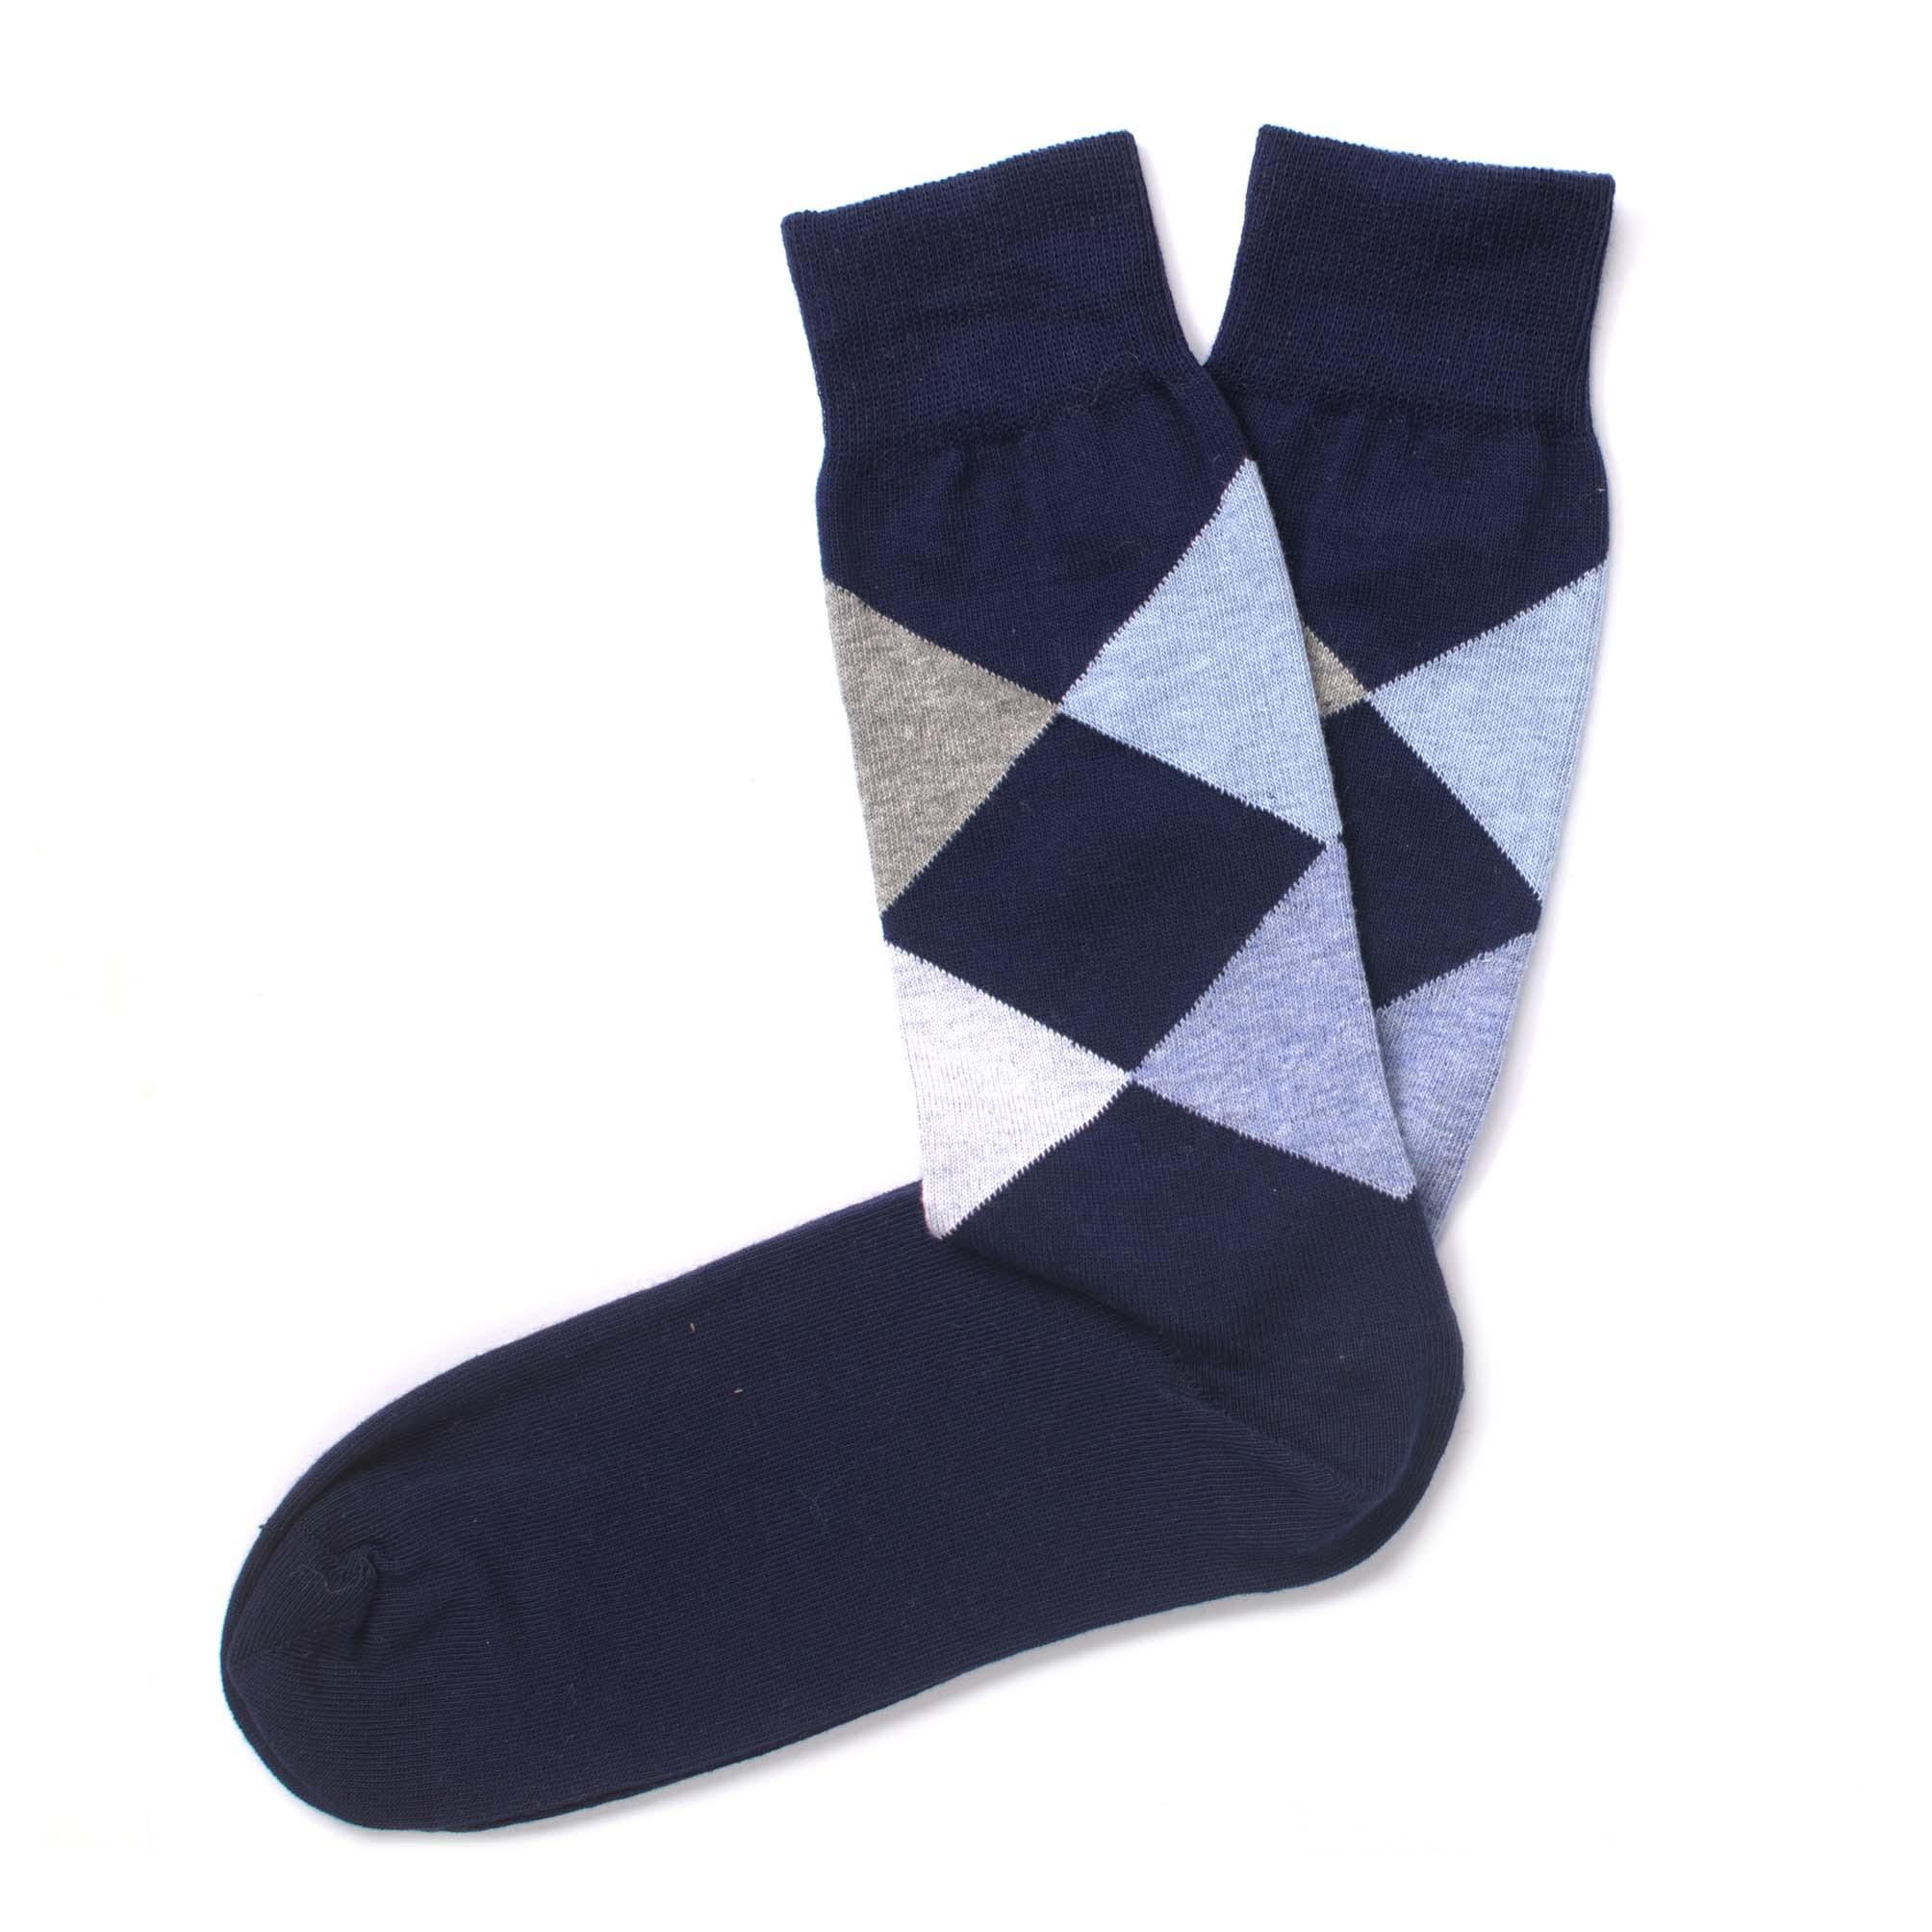 Socks navy, multi colour check